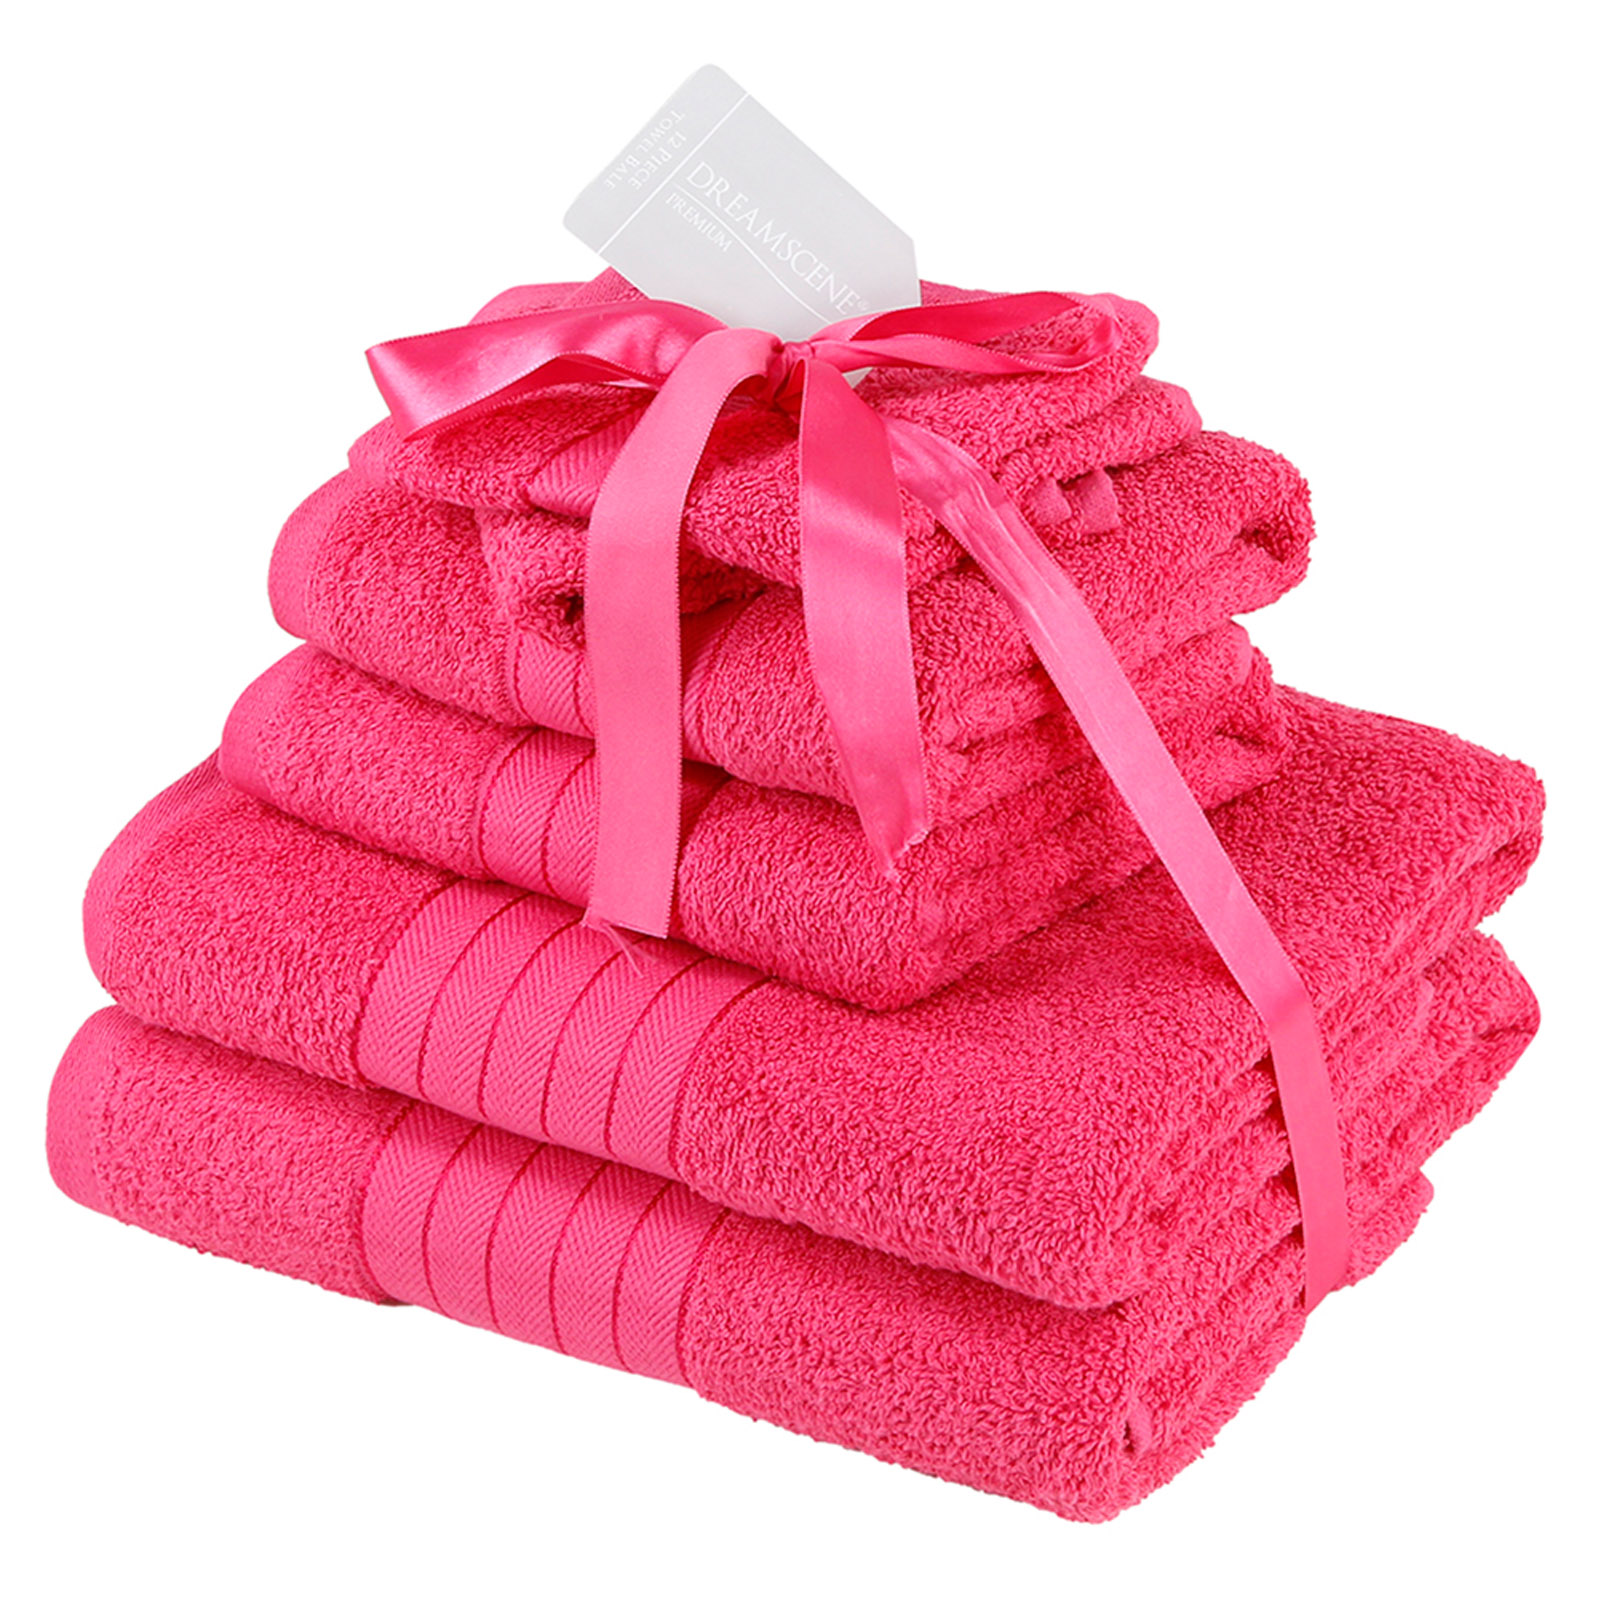 Dreamscene-Luxury-100-Cotton-Face-Hand-Bath-6-Piece-Bathroom-Towel-Bale-Set-NEW thumbnail 18